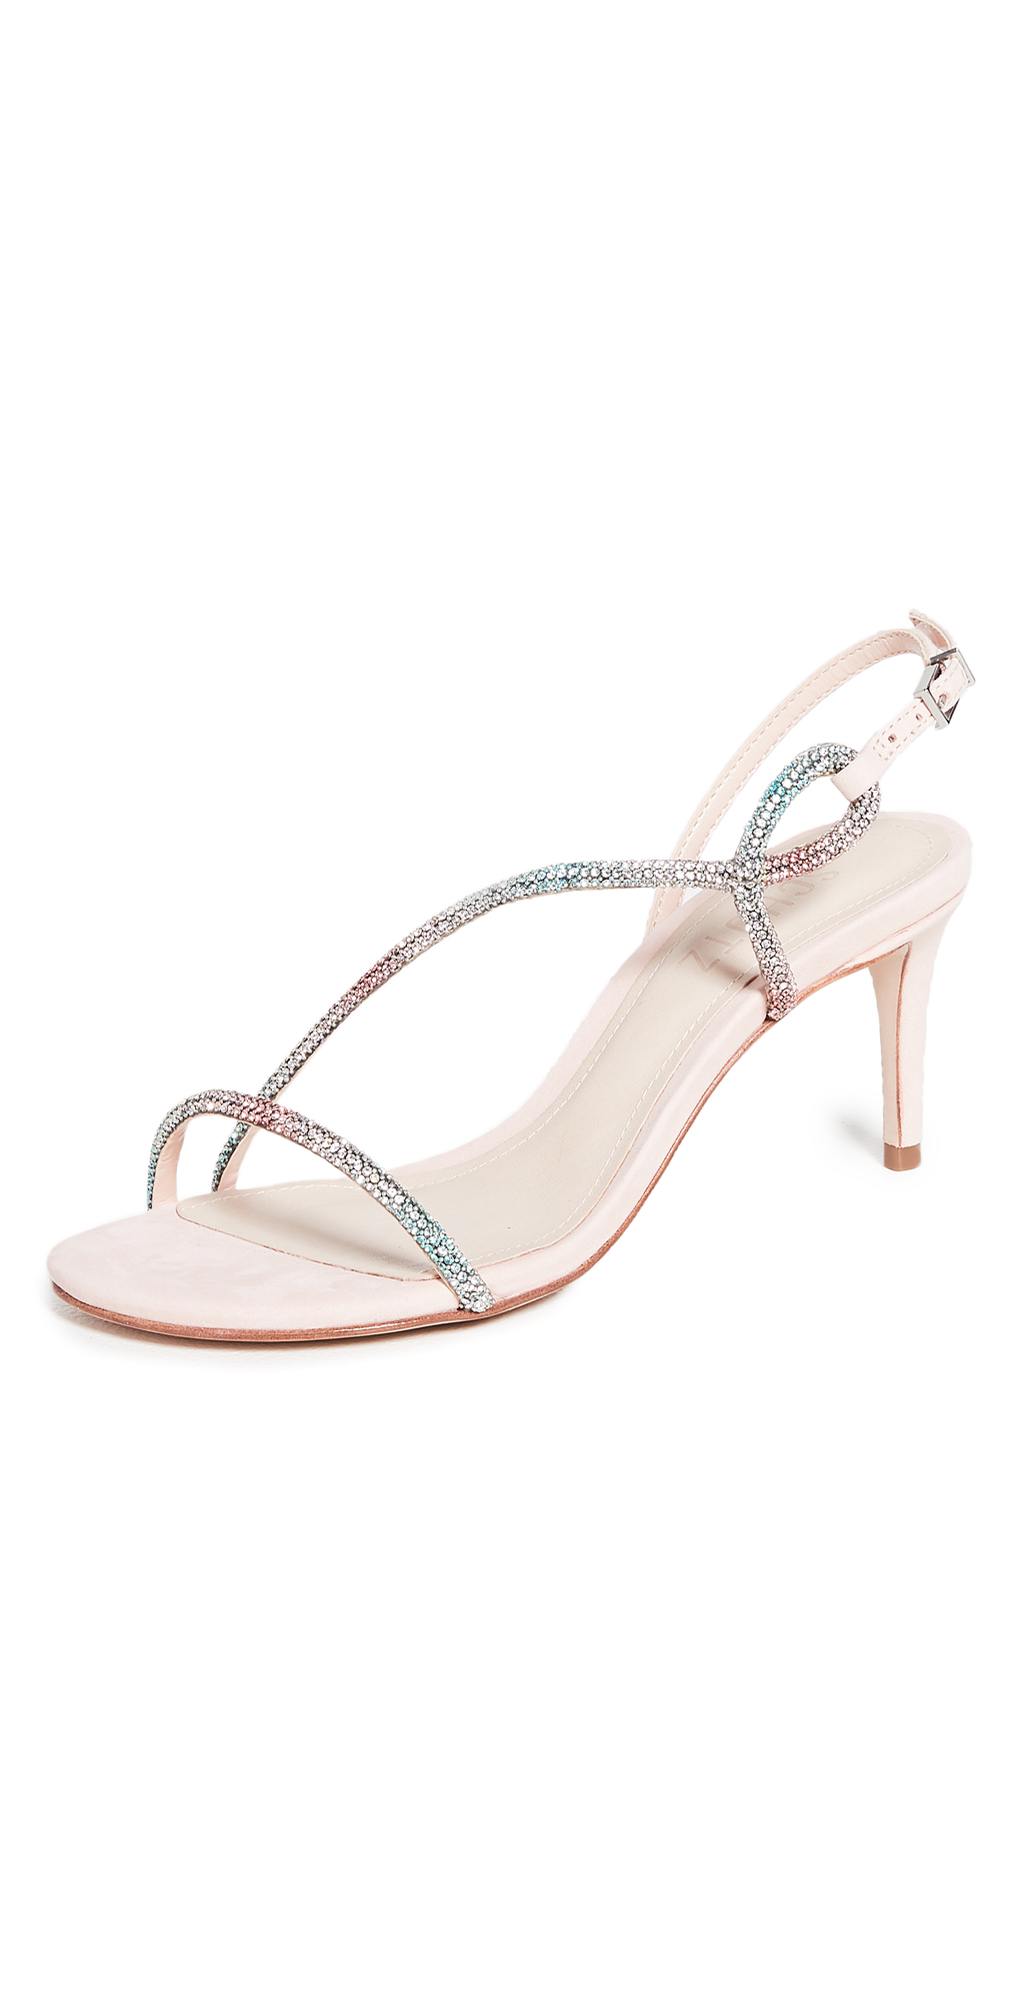 Schutz Rilana Sandals